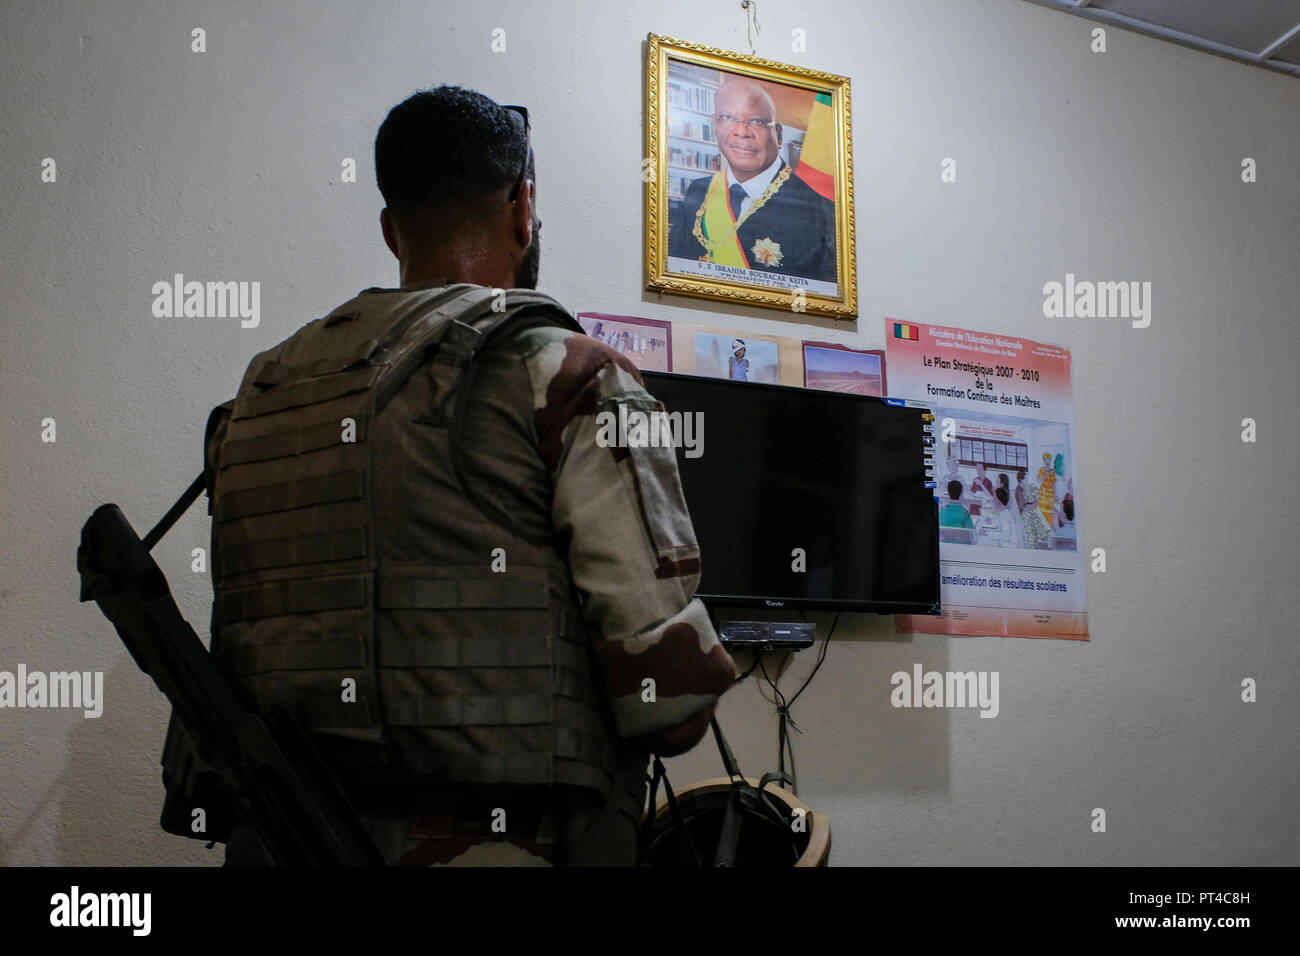 Gao's French base in Mali is the largest of the Barkhane external operation. It is from this base that the operations are launched against terrorist armed groups.. Gao - Mali - august 2018. La base française de Gao au Mali est la plus importante de l'opération extérieure Barkhane. C'est depuis cette emprise que les opérations sont lancées contre les groupes armés terroristes.. Gao - Mali - août 2018. Stock Photo